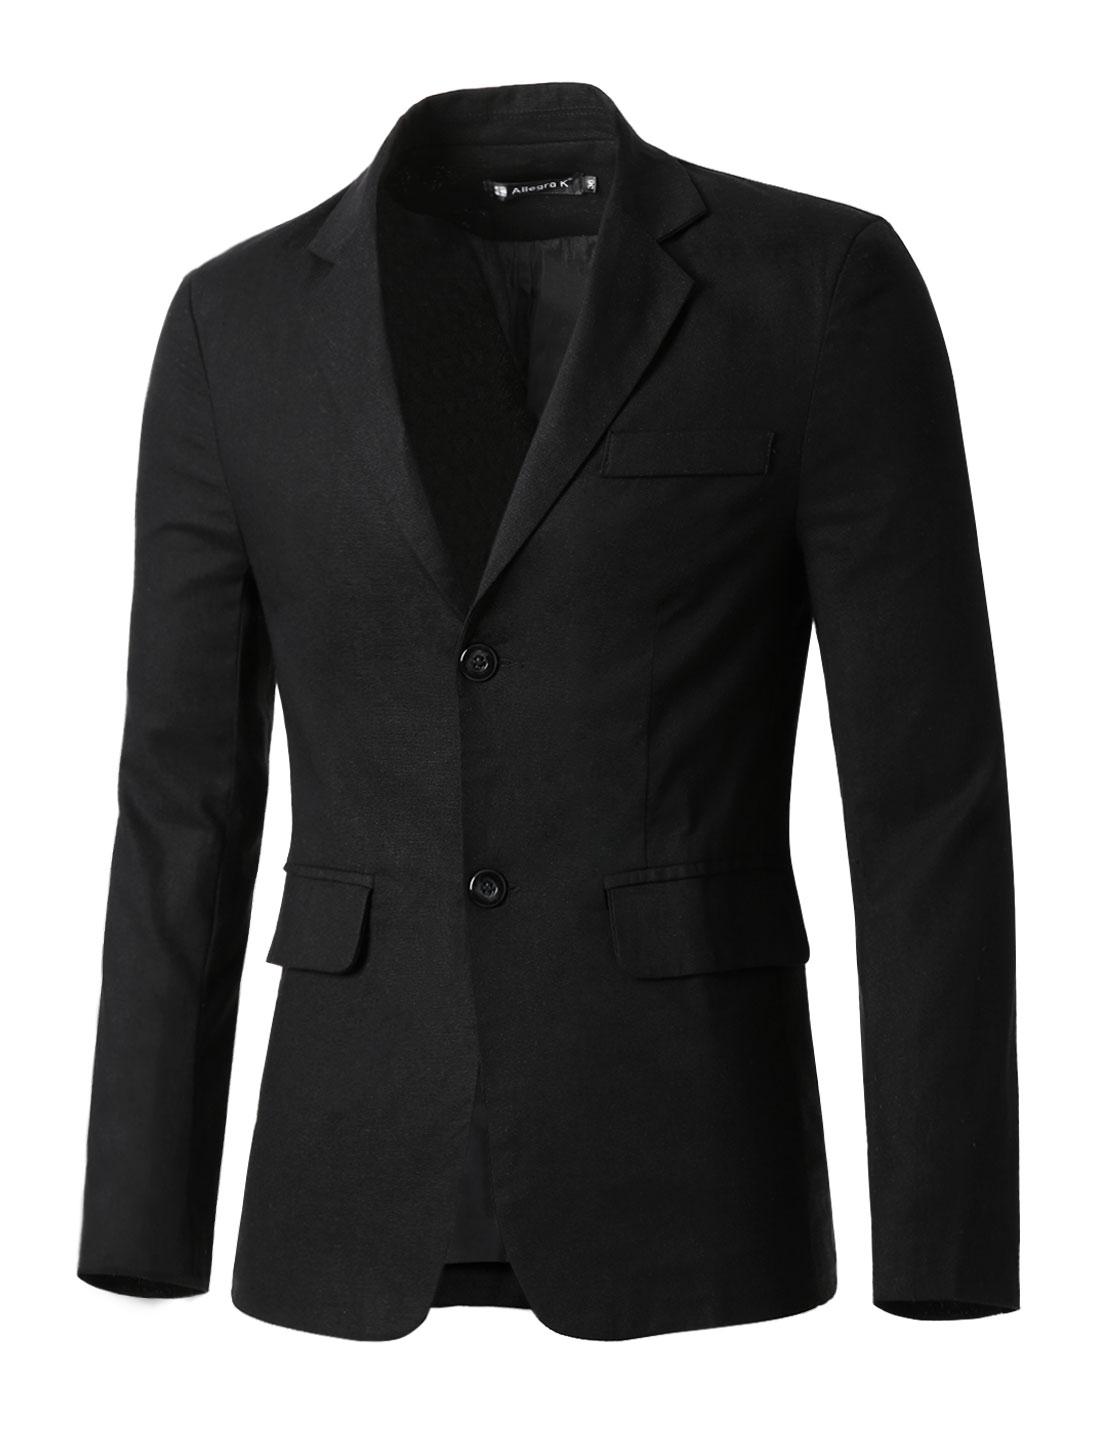 Unique Bargains Men's Padded Shoulders Notched Lapel Two-Button Long Sleeves Blazer